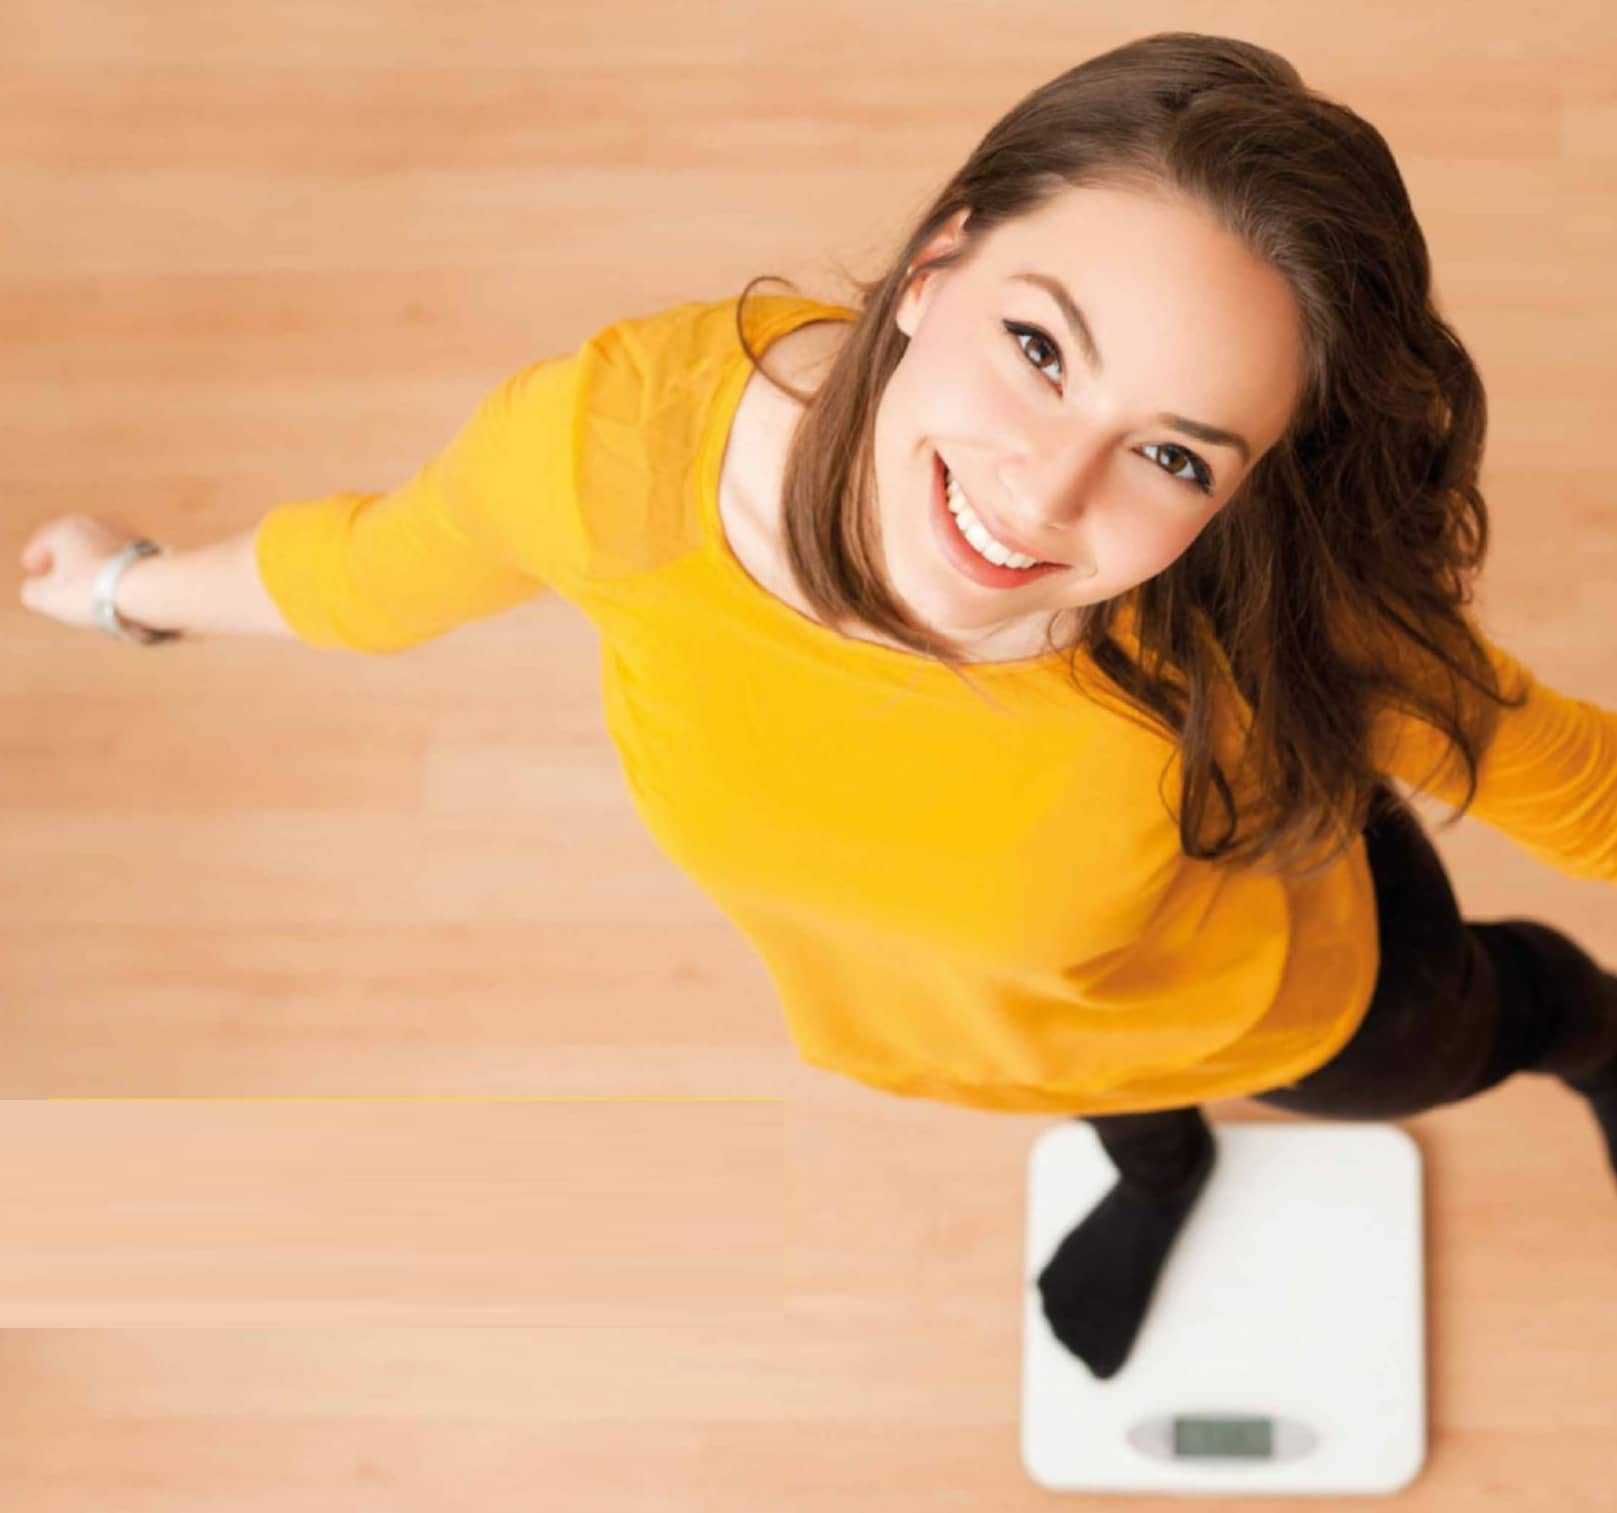 3 Alternative Weight Loss Methods To Consider